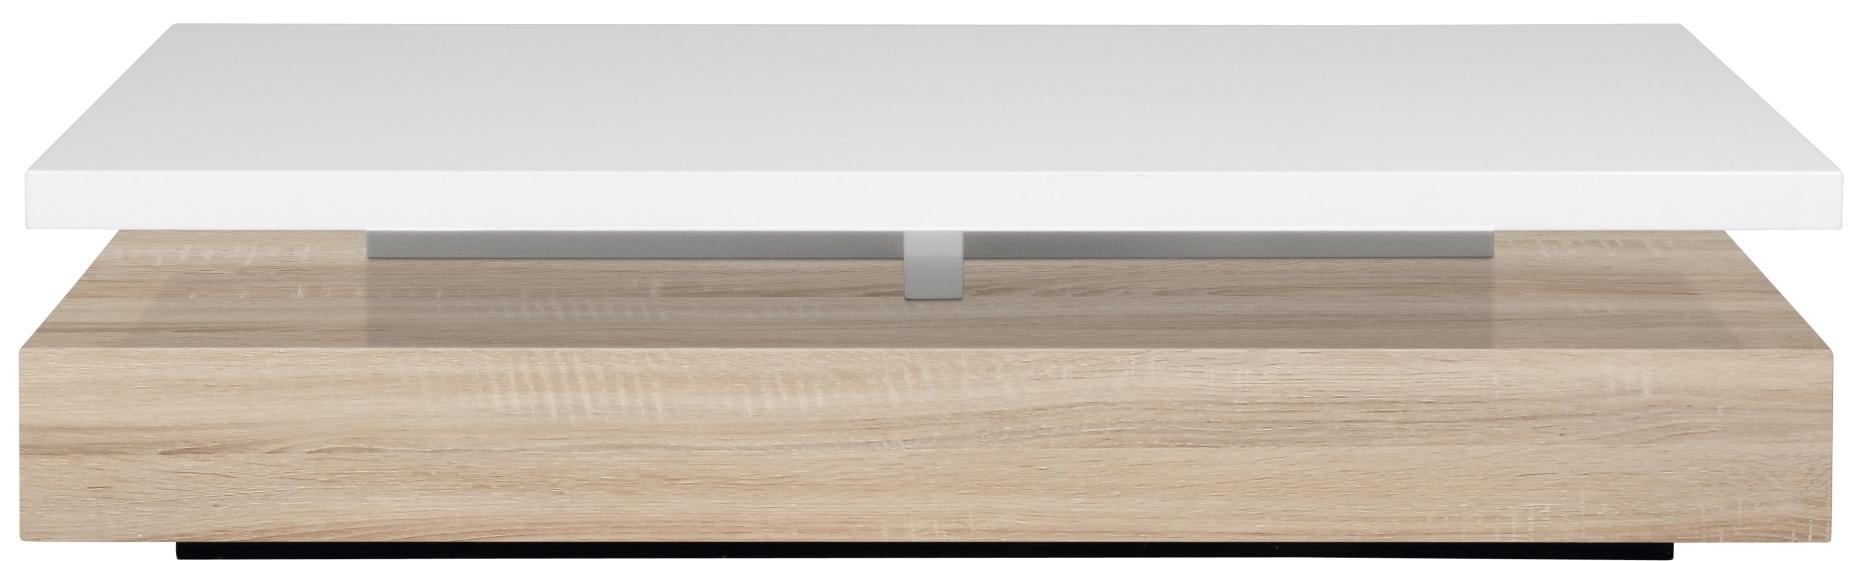 Eetkamer eetkamertafel eikenhout : 24Designs Salontafel Melissa L117 x B58 x H29 cm Wit Eiken